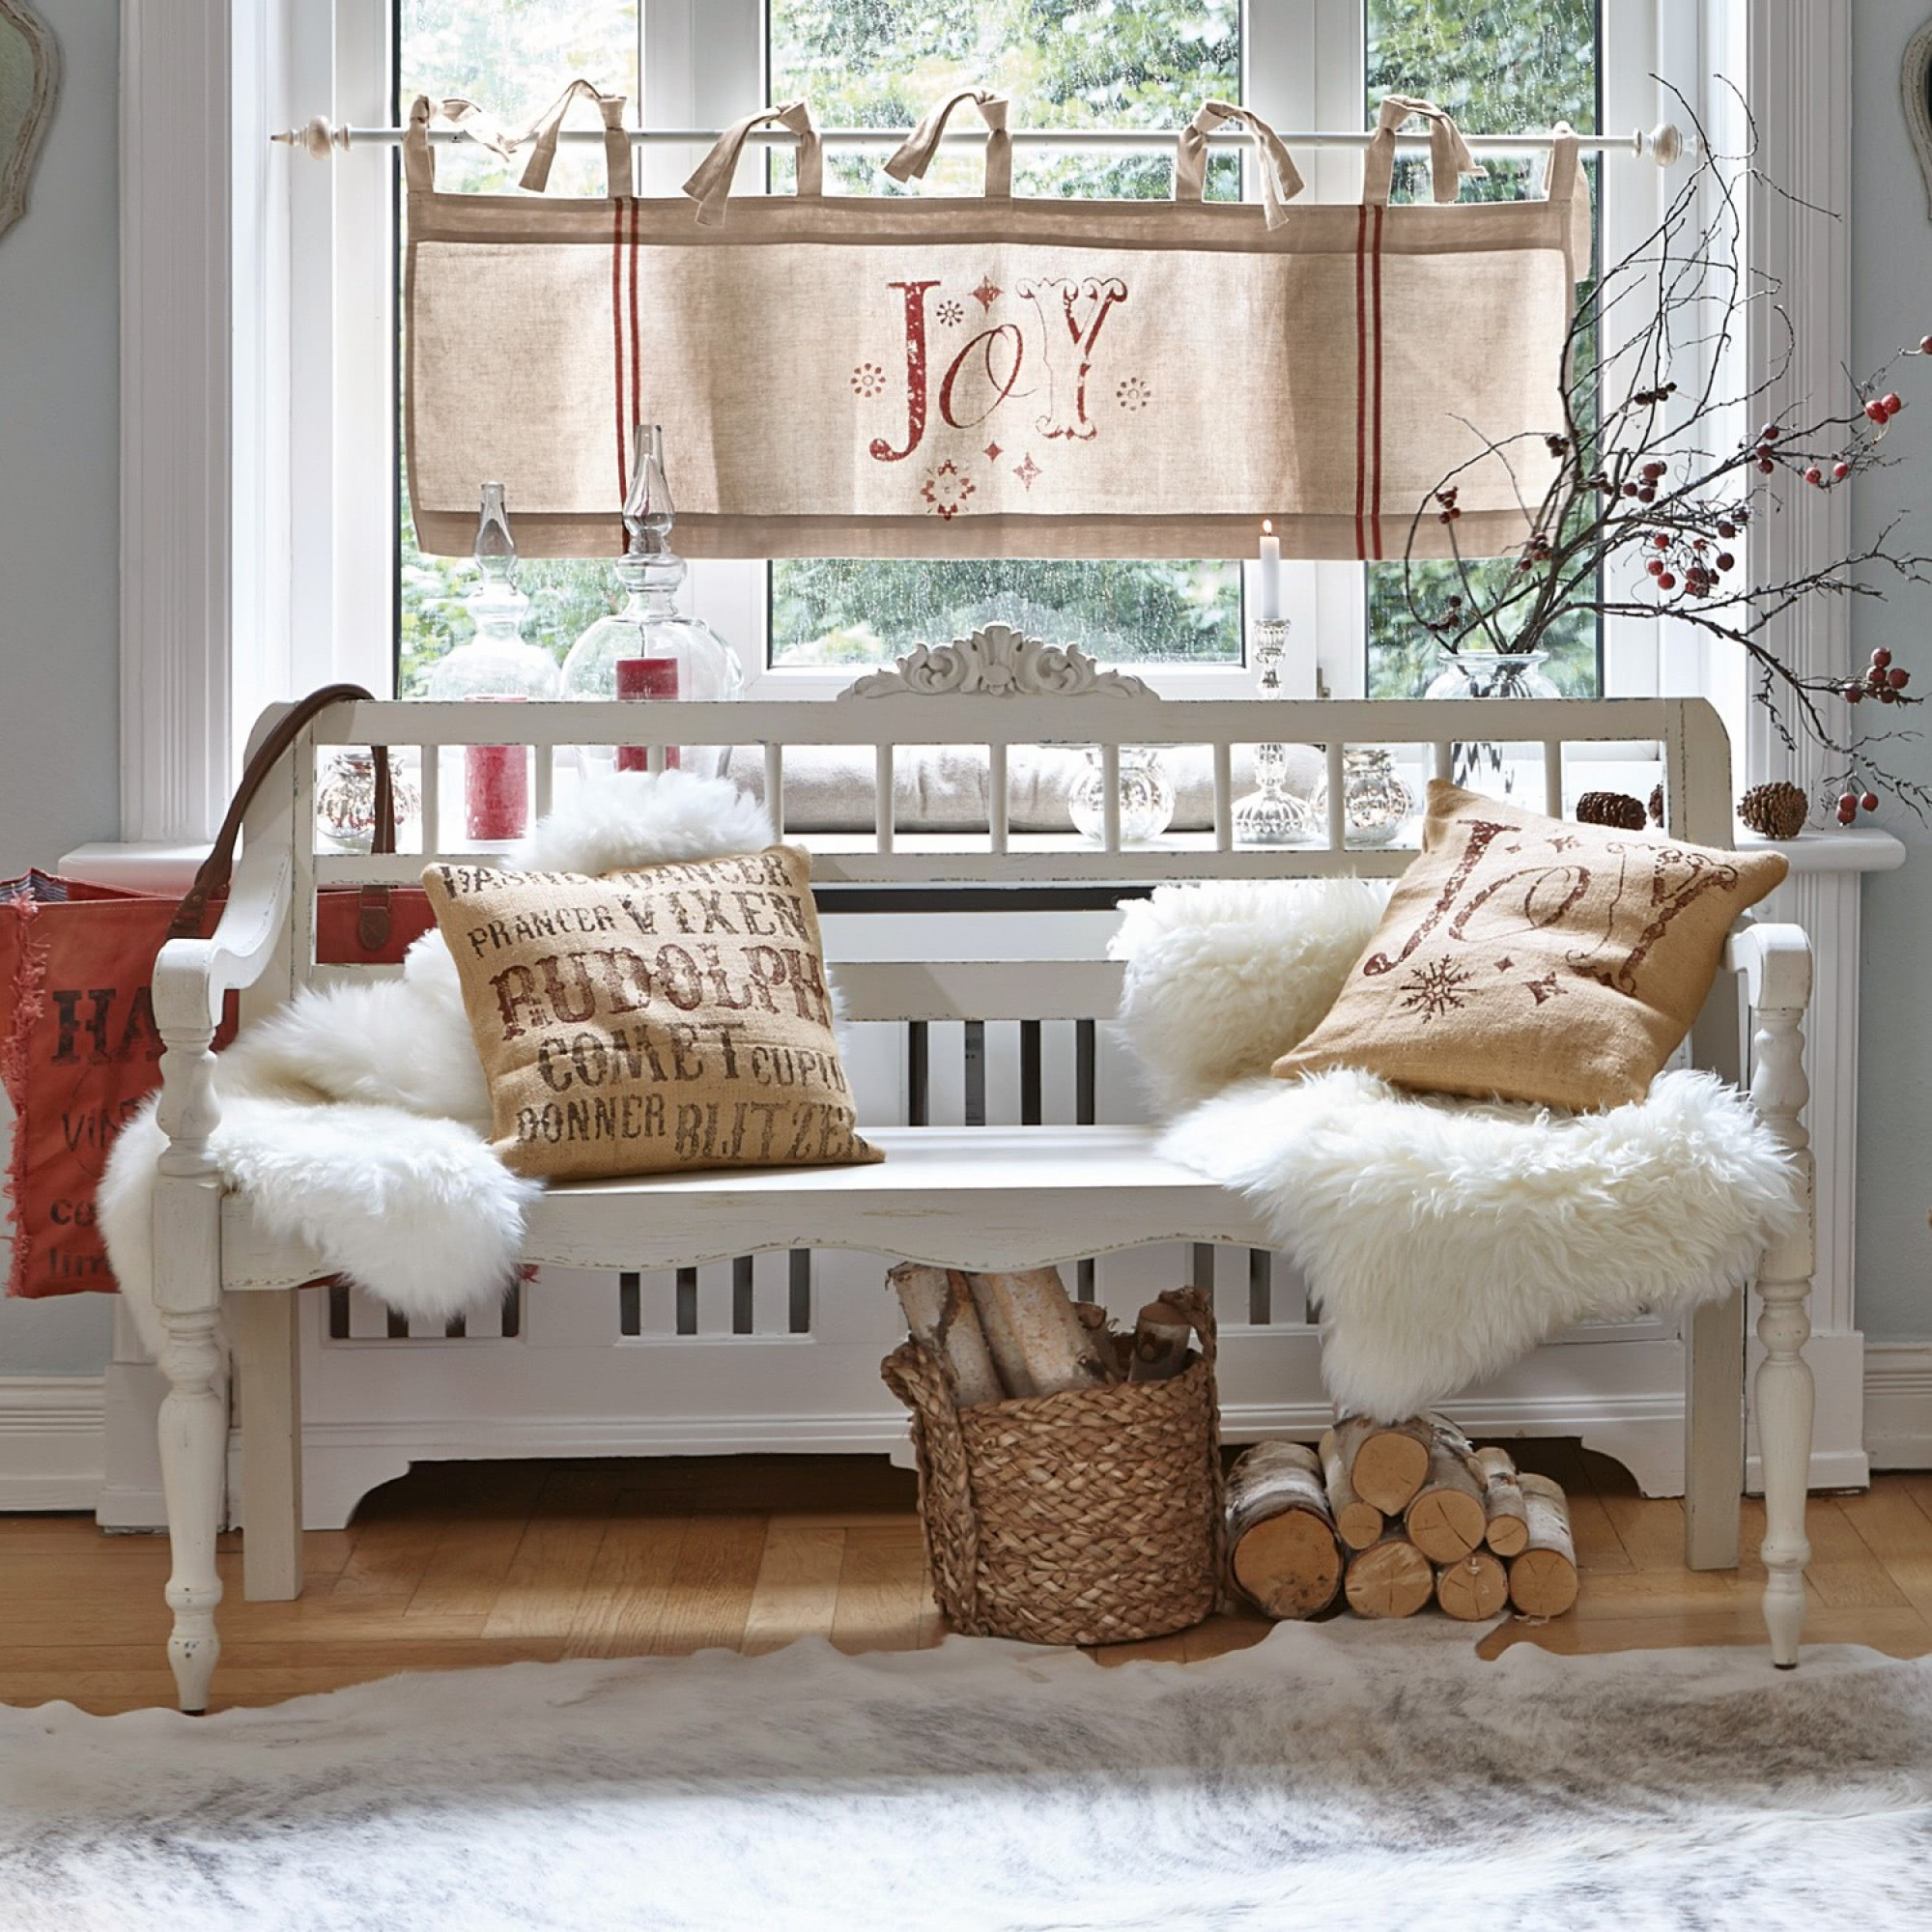 bank elkridge loberon coming home. Black Bedroom Furniture Sets. Home Design Ideas